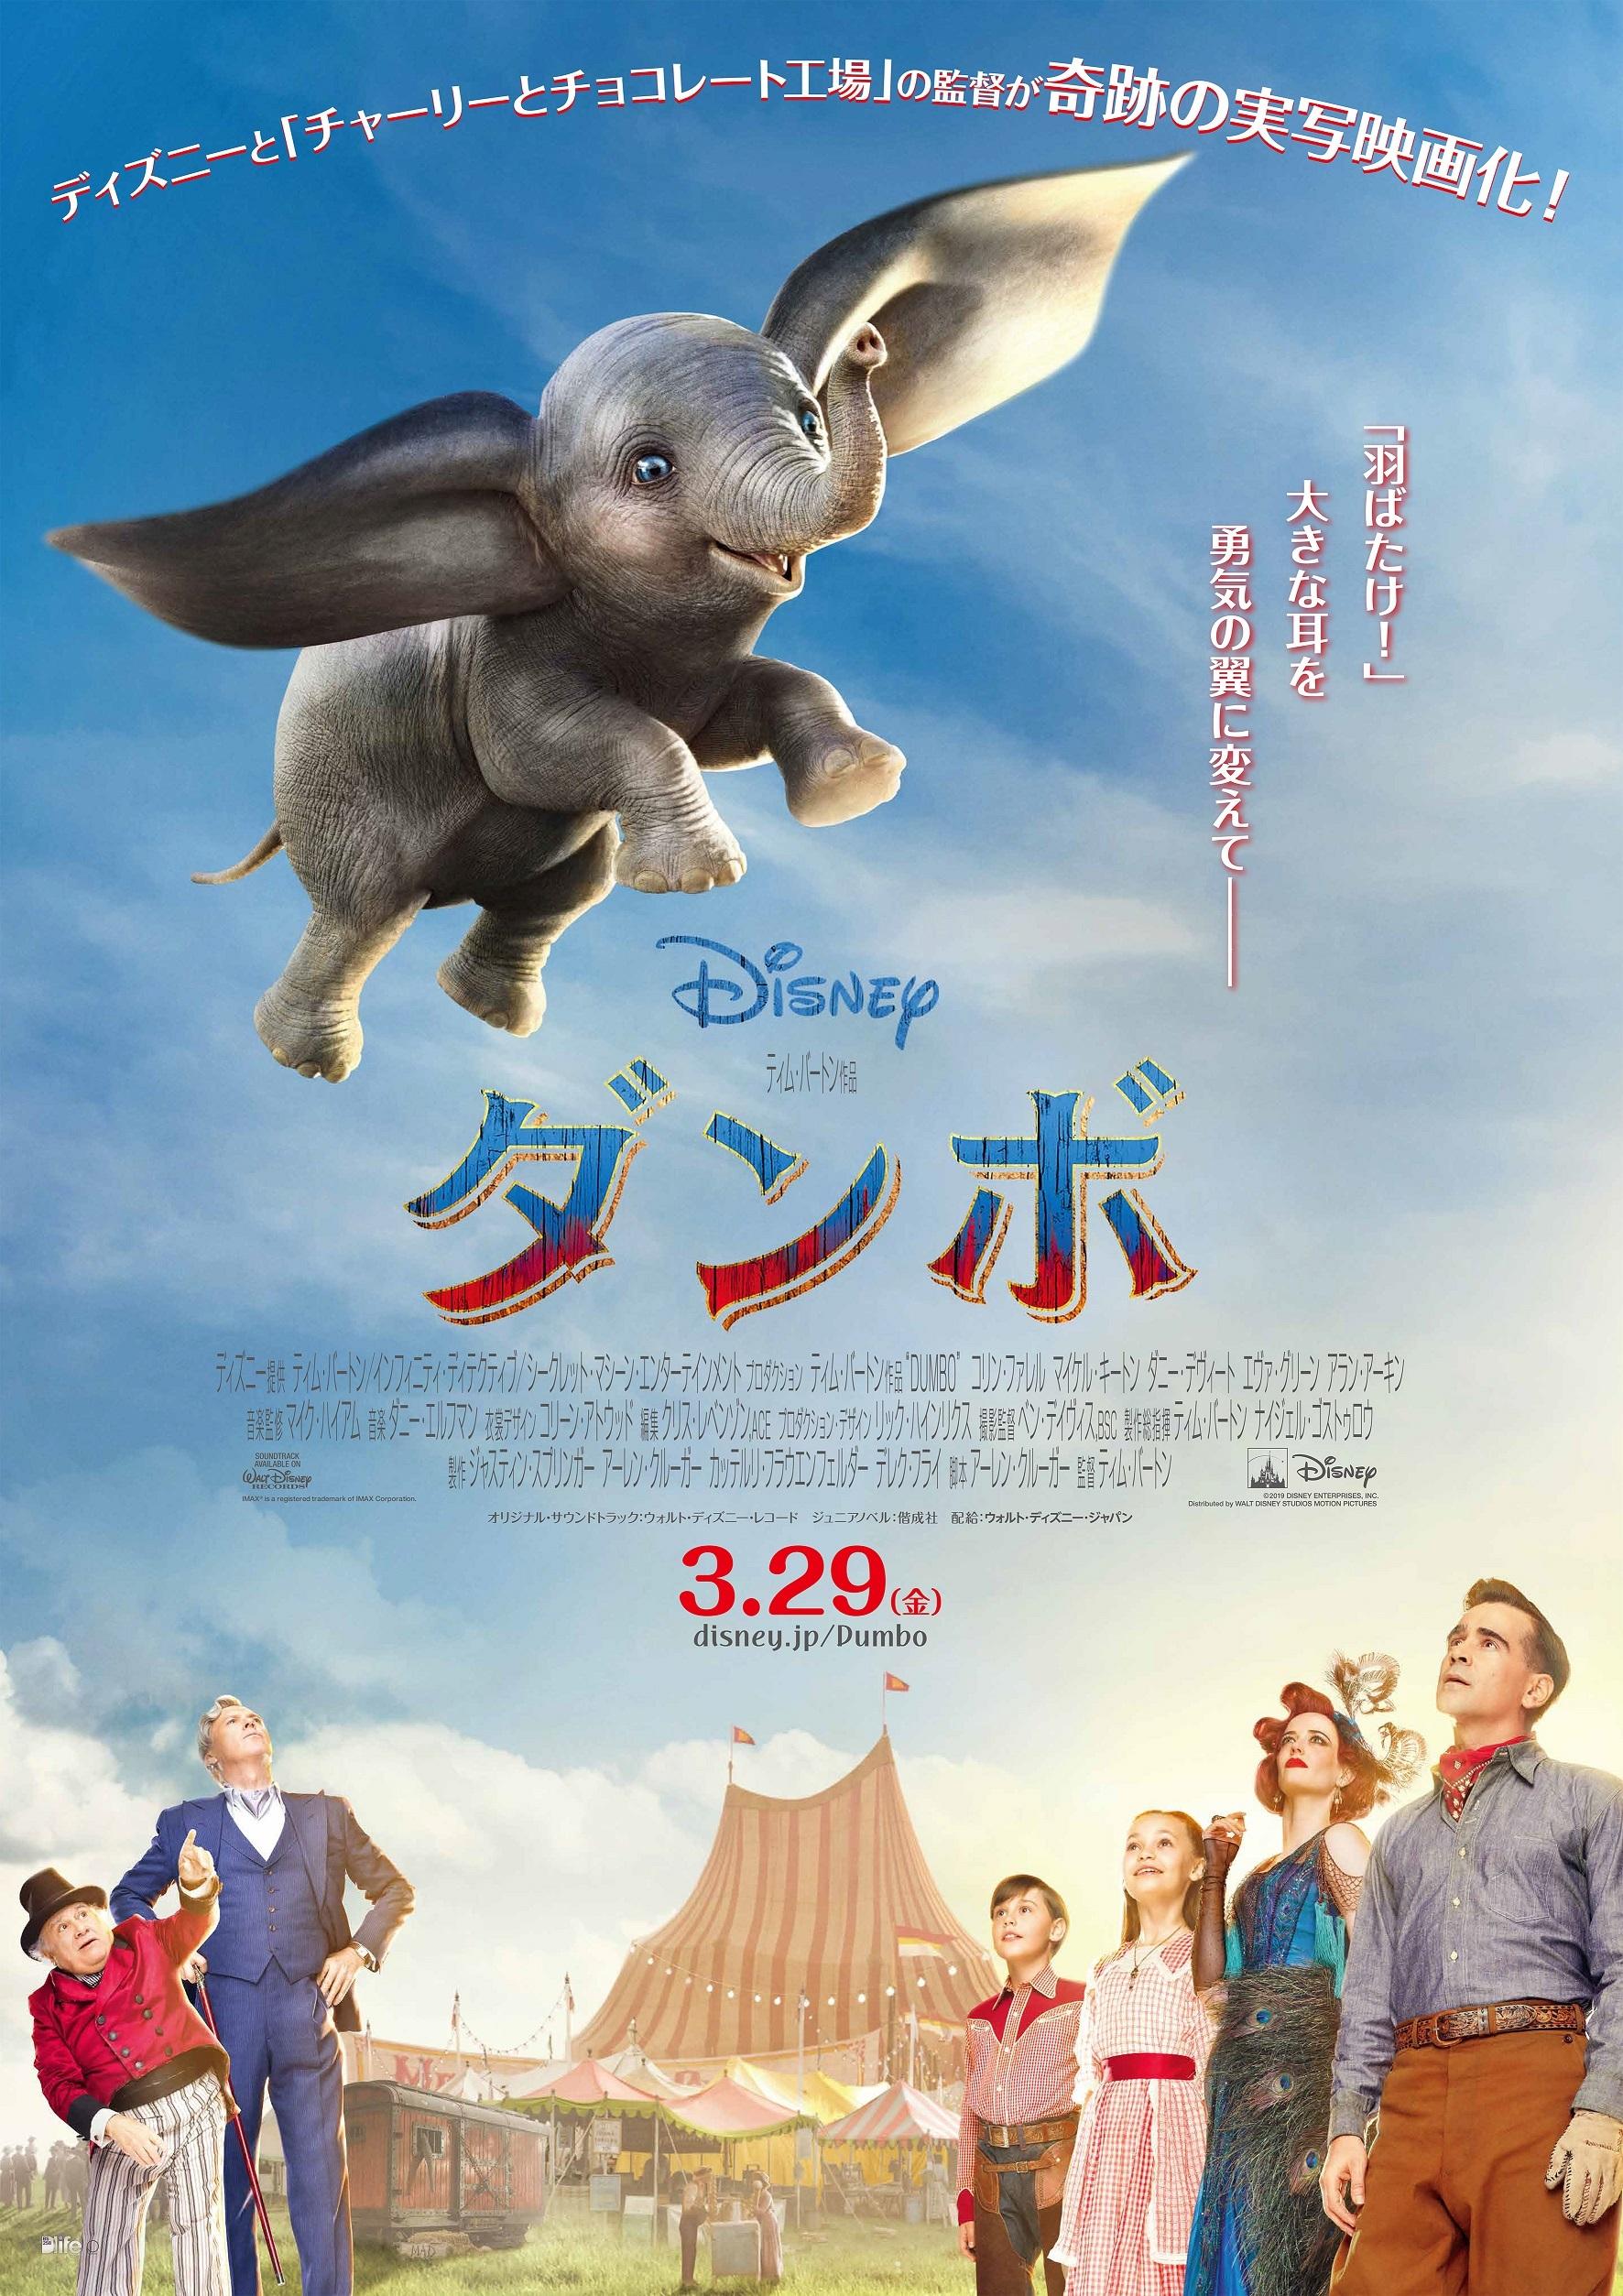 (C)2019 Disney Enterprises, Inc. All Rights Reserved. 3月29日(金)全国公開